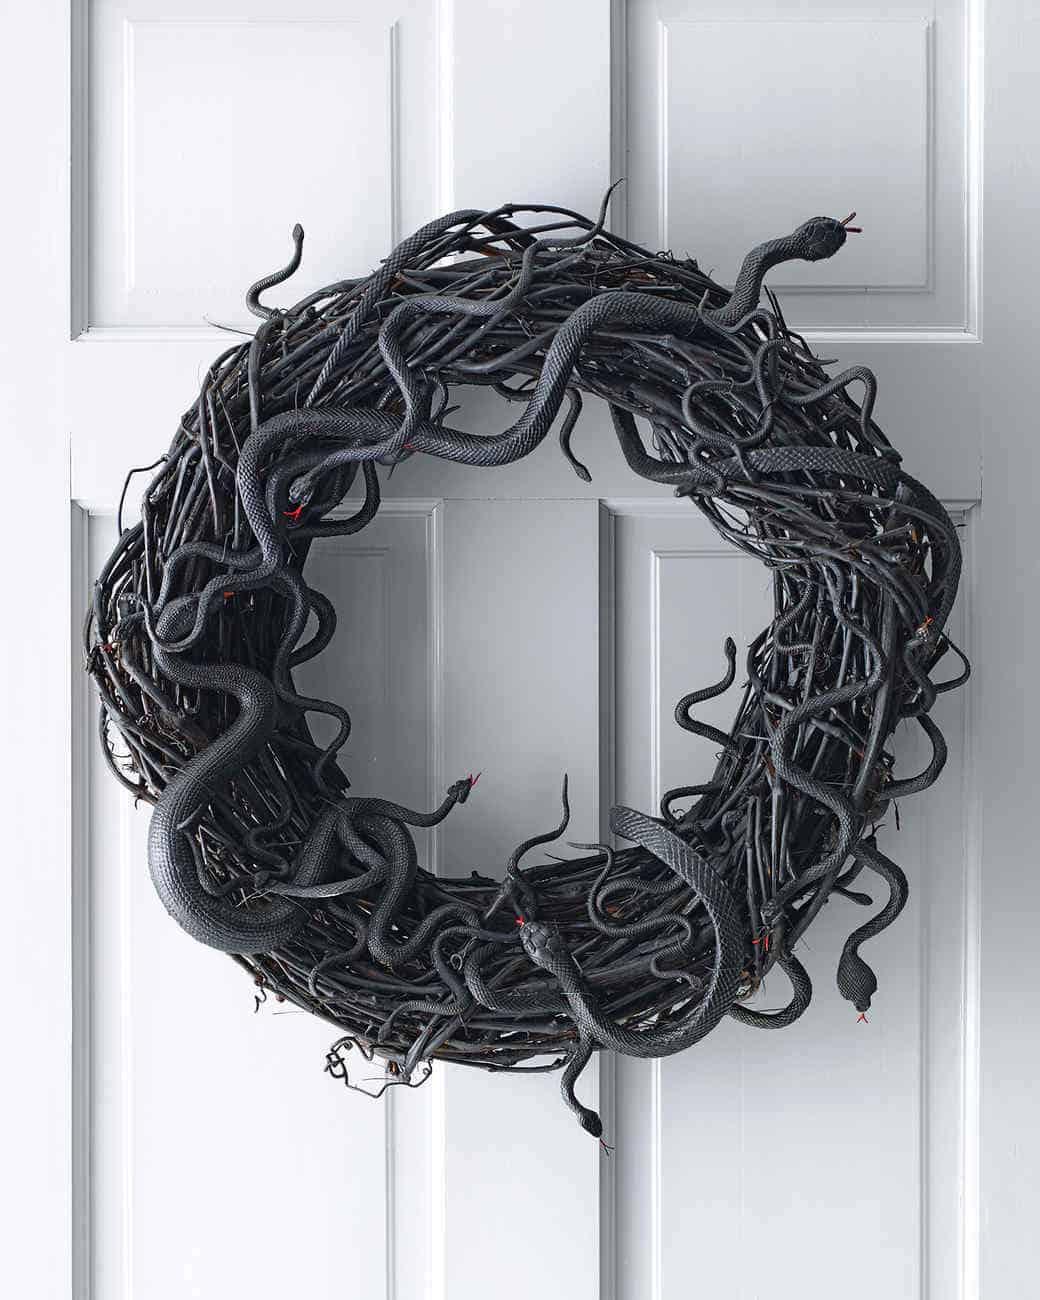 Wriggling snakes halloween wreath